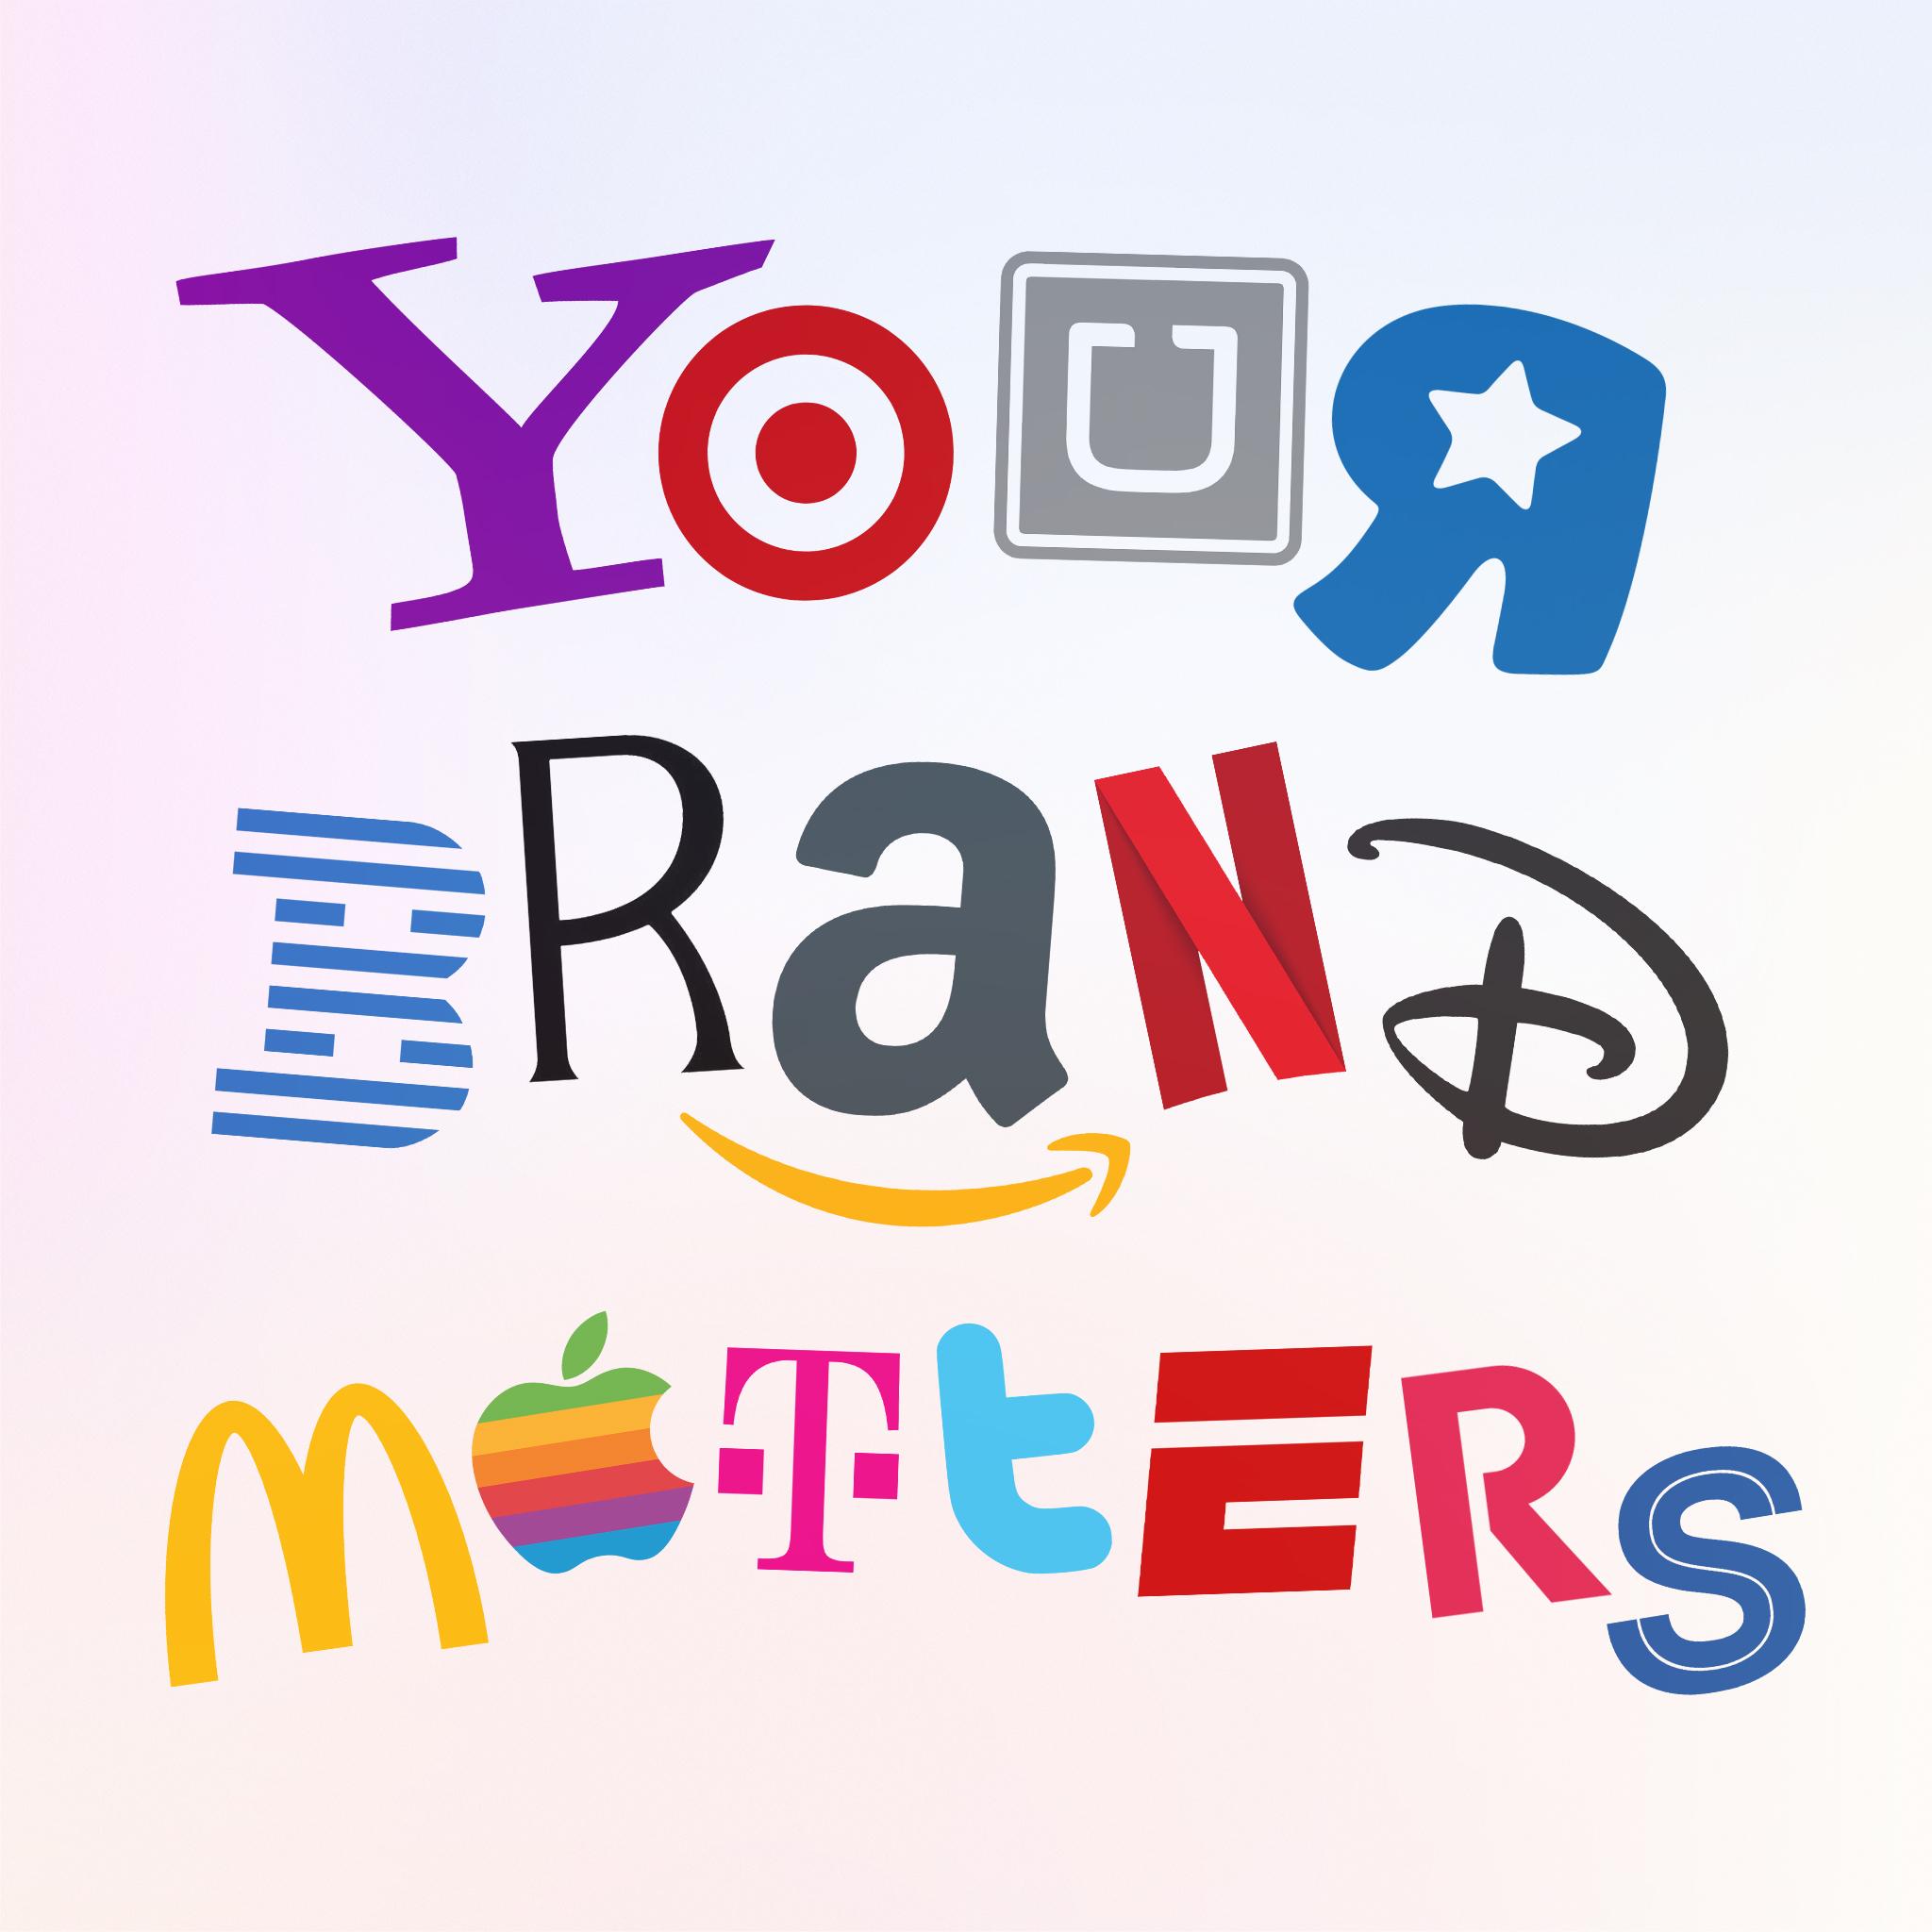 Your Brand Matters2.jpg